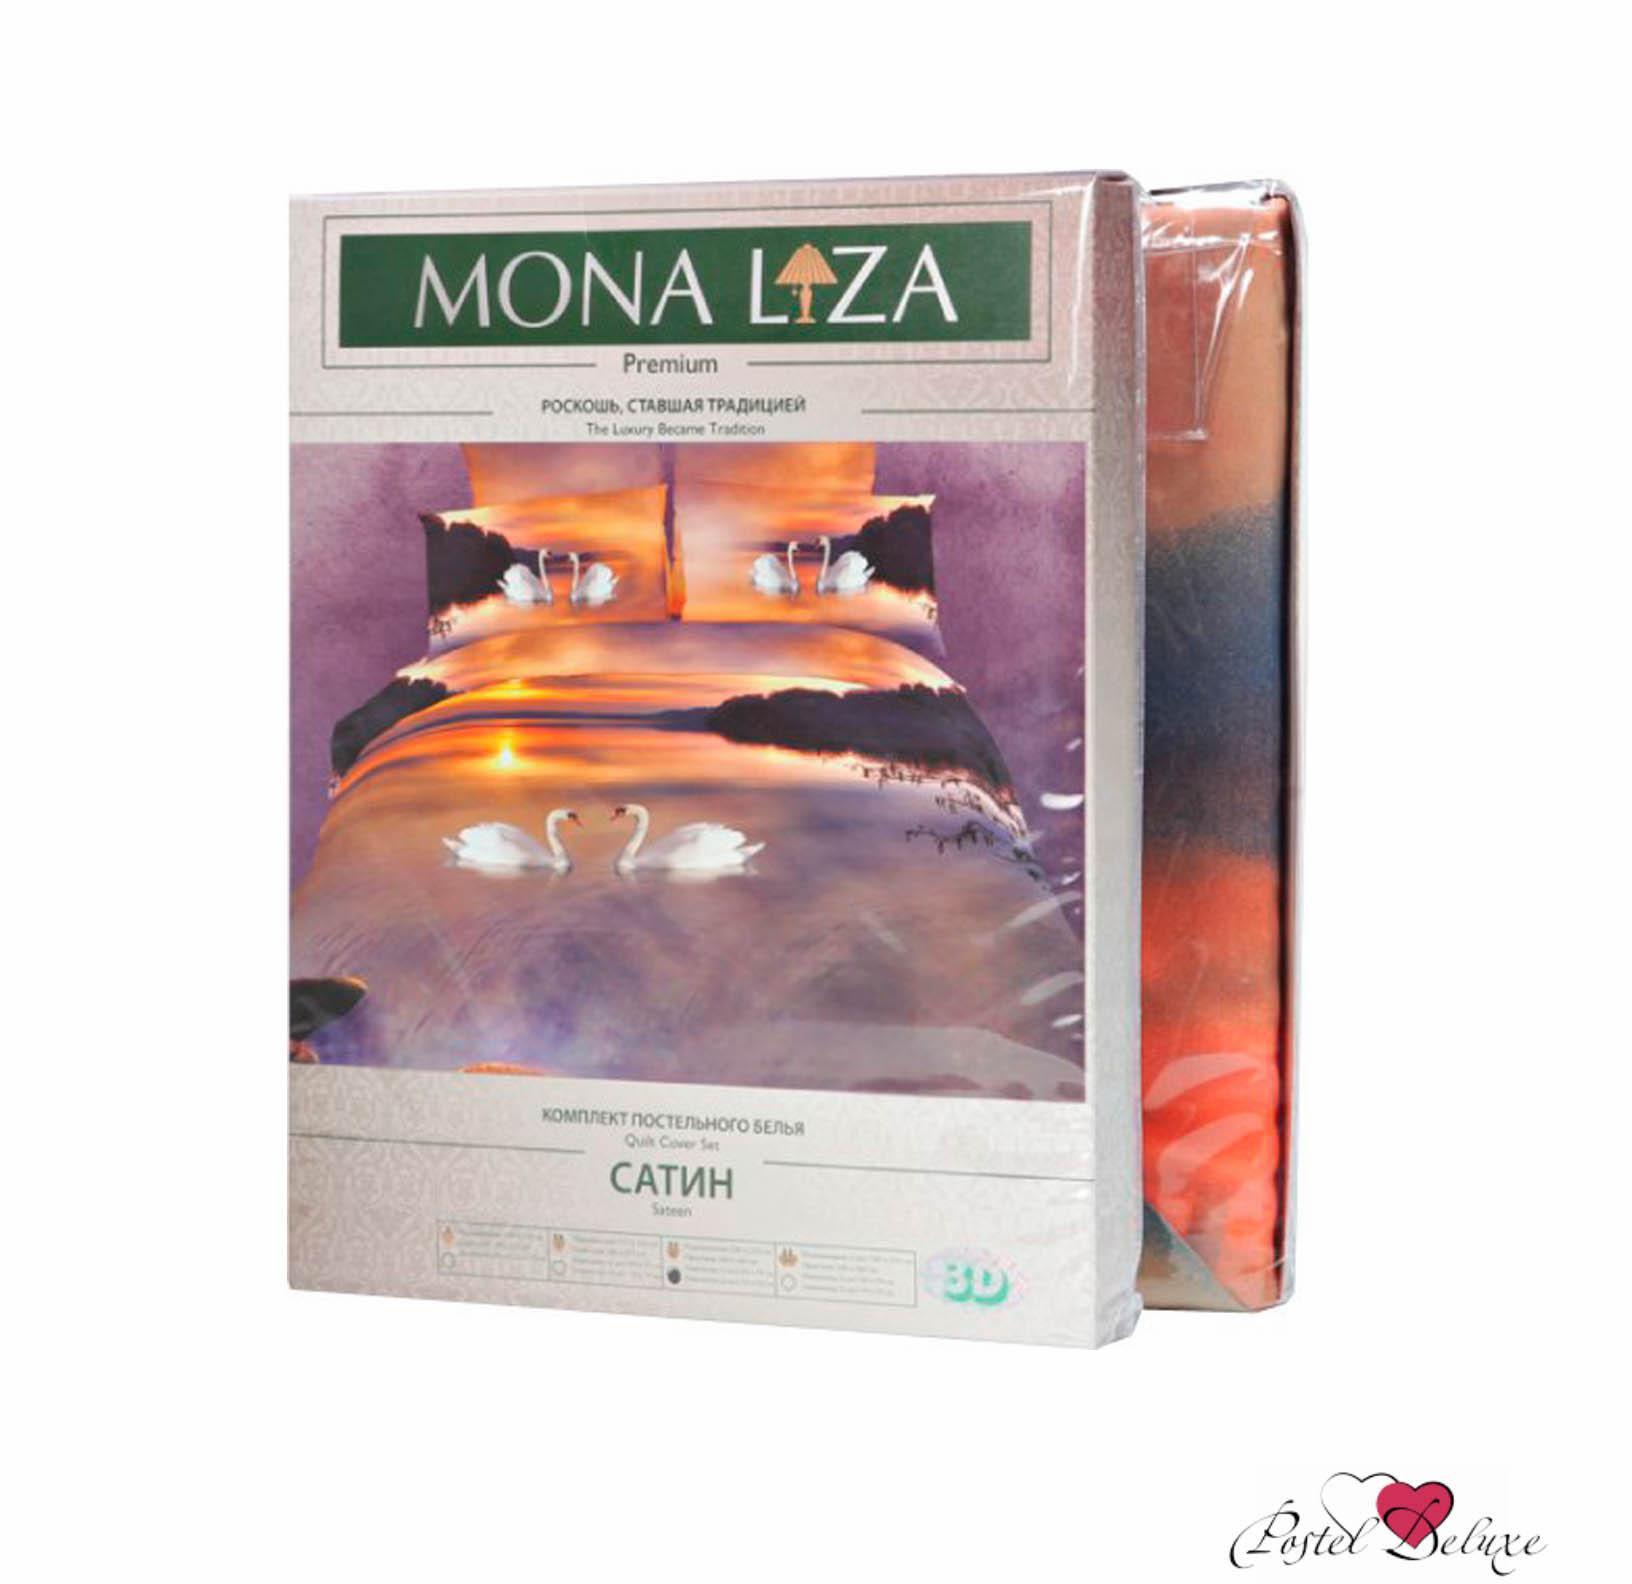 Постельное белье Mona Liza Постельное белье Pet (2 сп. евро) комплект пб 2 сп mona liza сатин жаккард royal 4 нав 2шт 70х70 и 2 шт